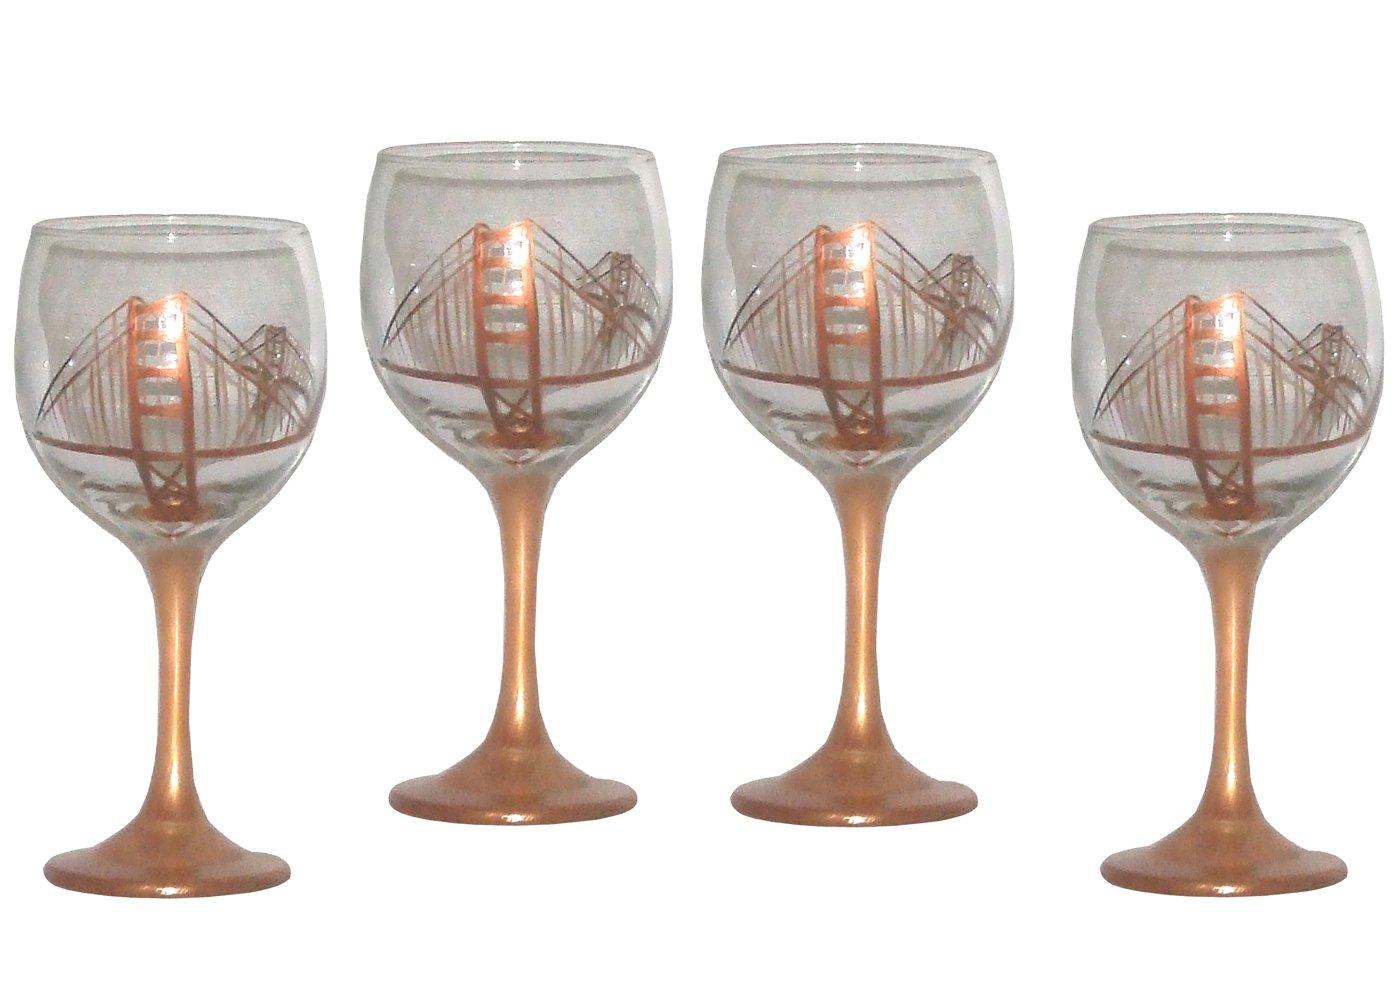 ArtisanStreet's San Francisco Hand Painted Wine Glasses - Set of 4